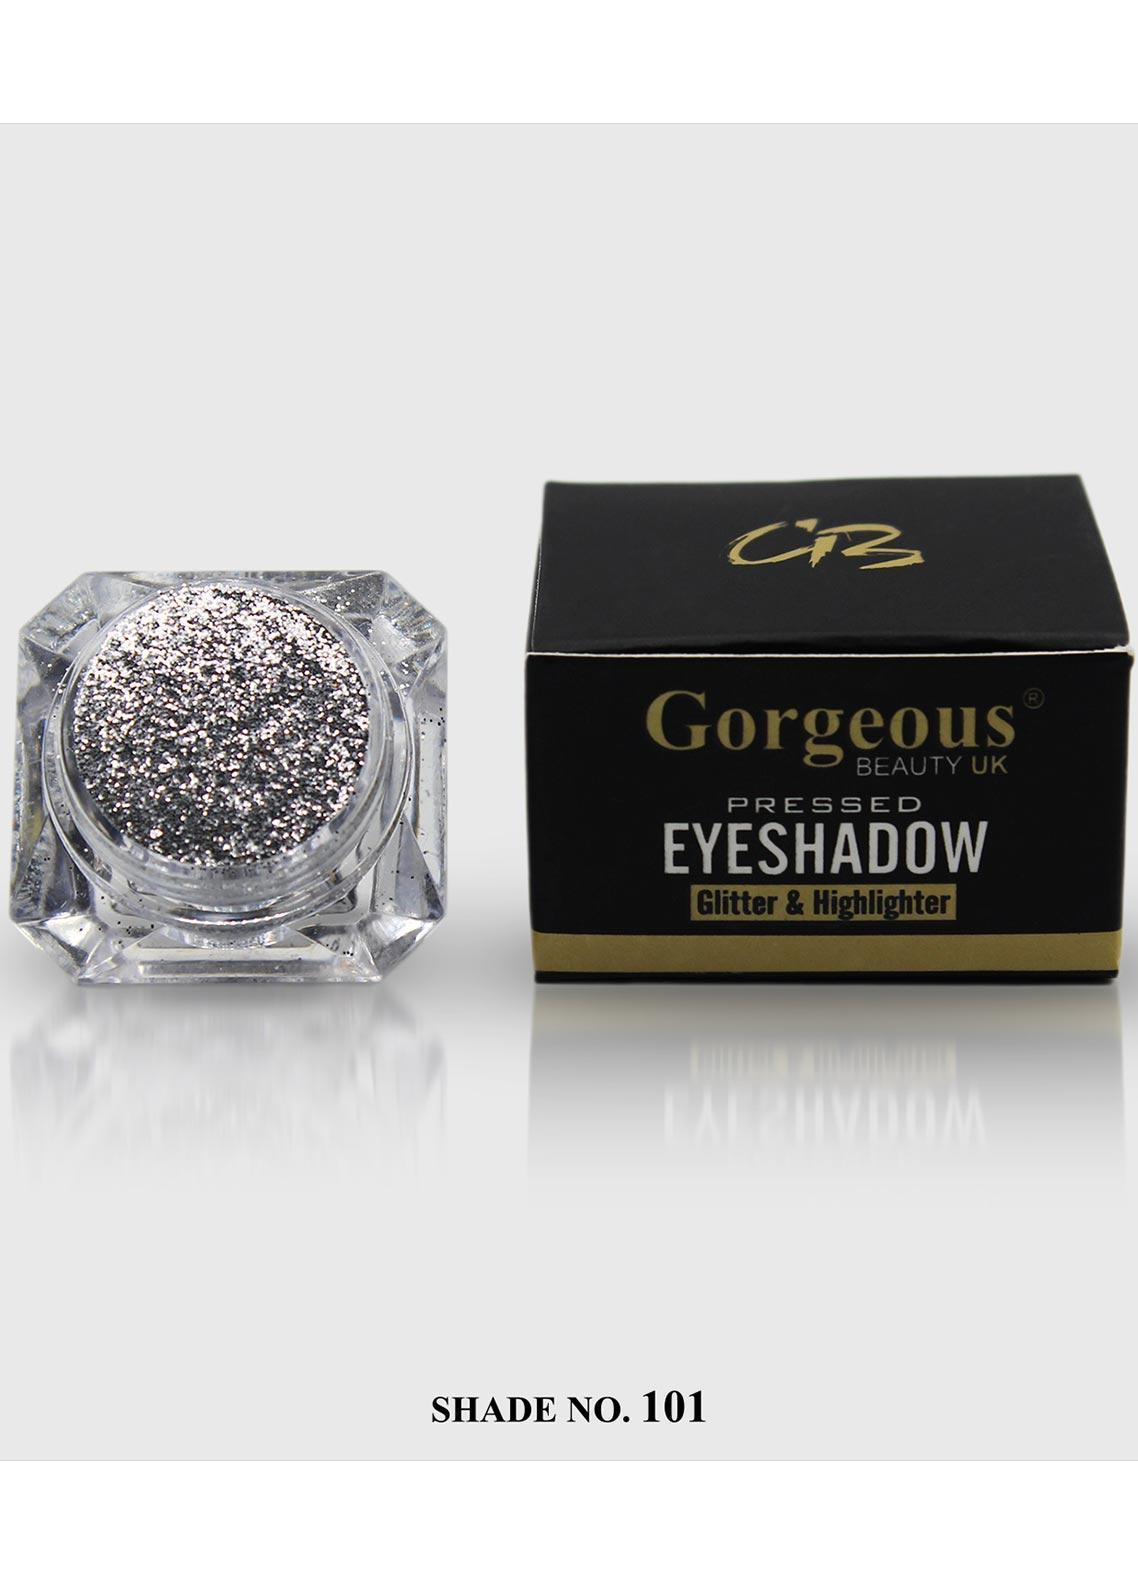 Pressed Eye Shadow Glitter & Highlighter-101